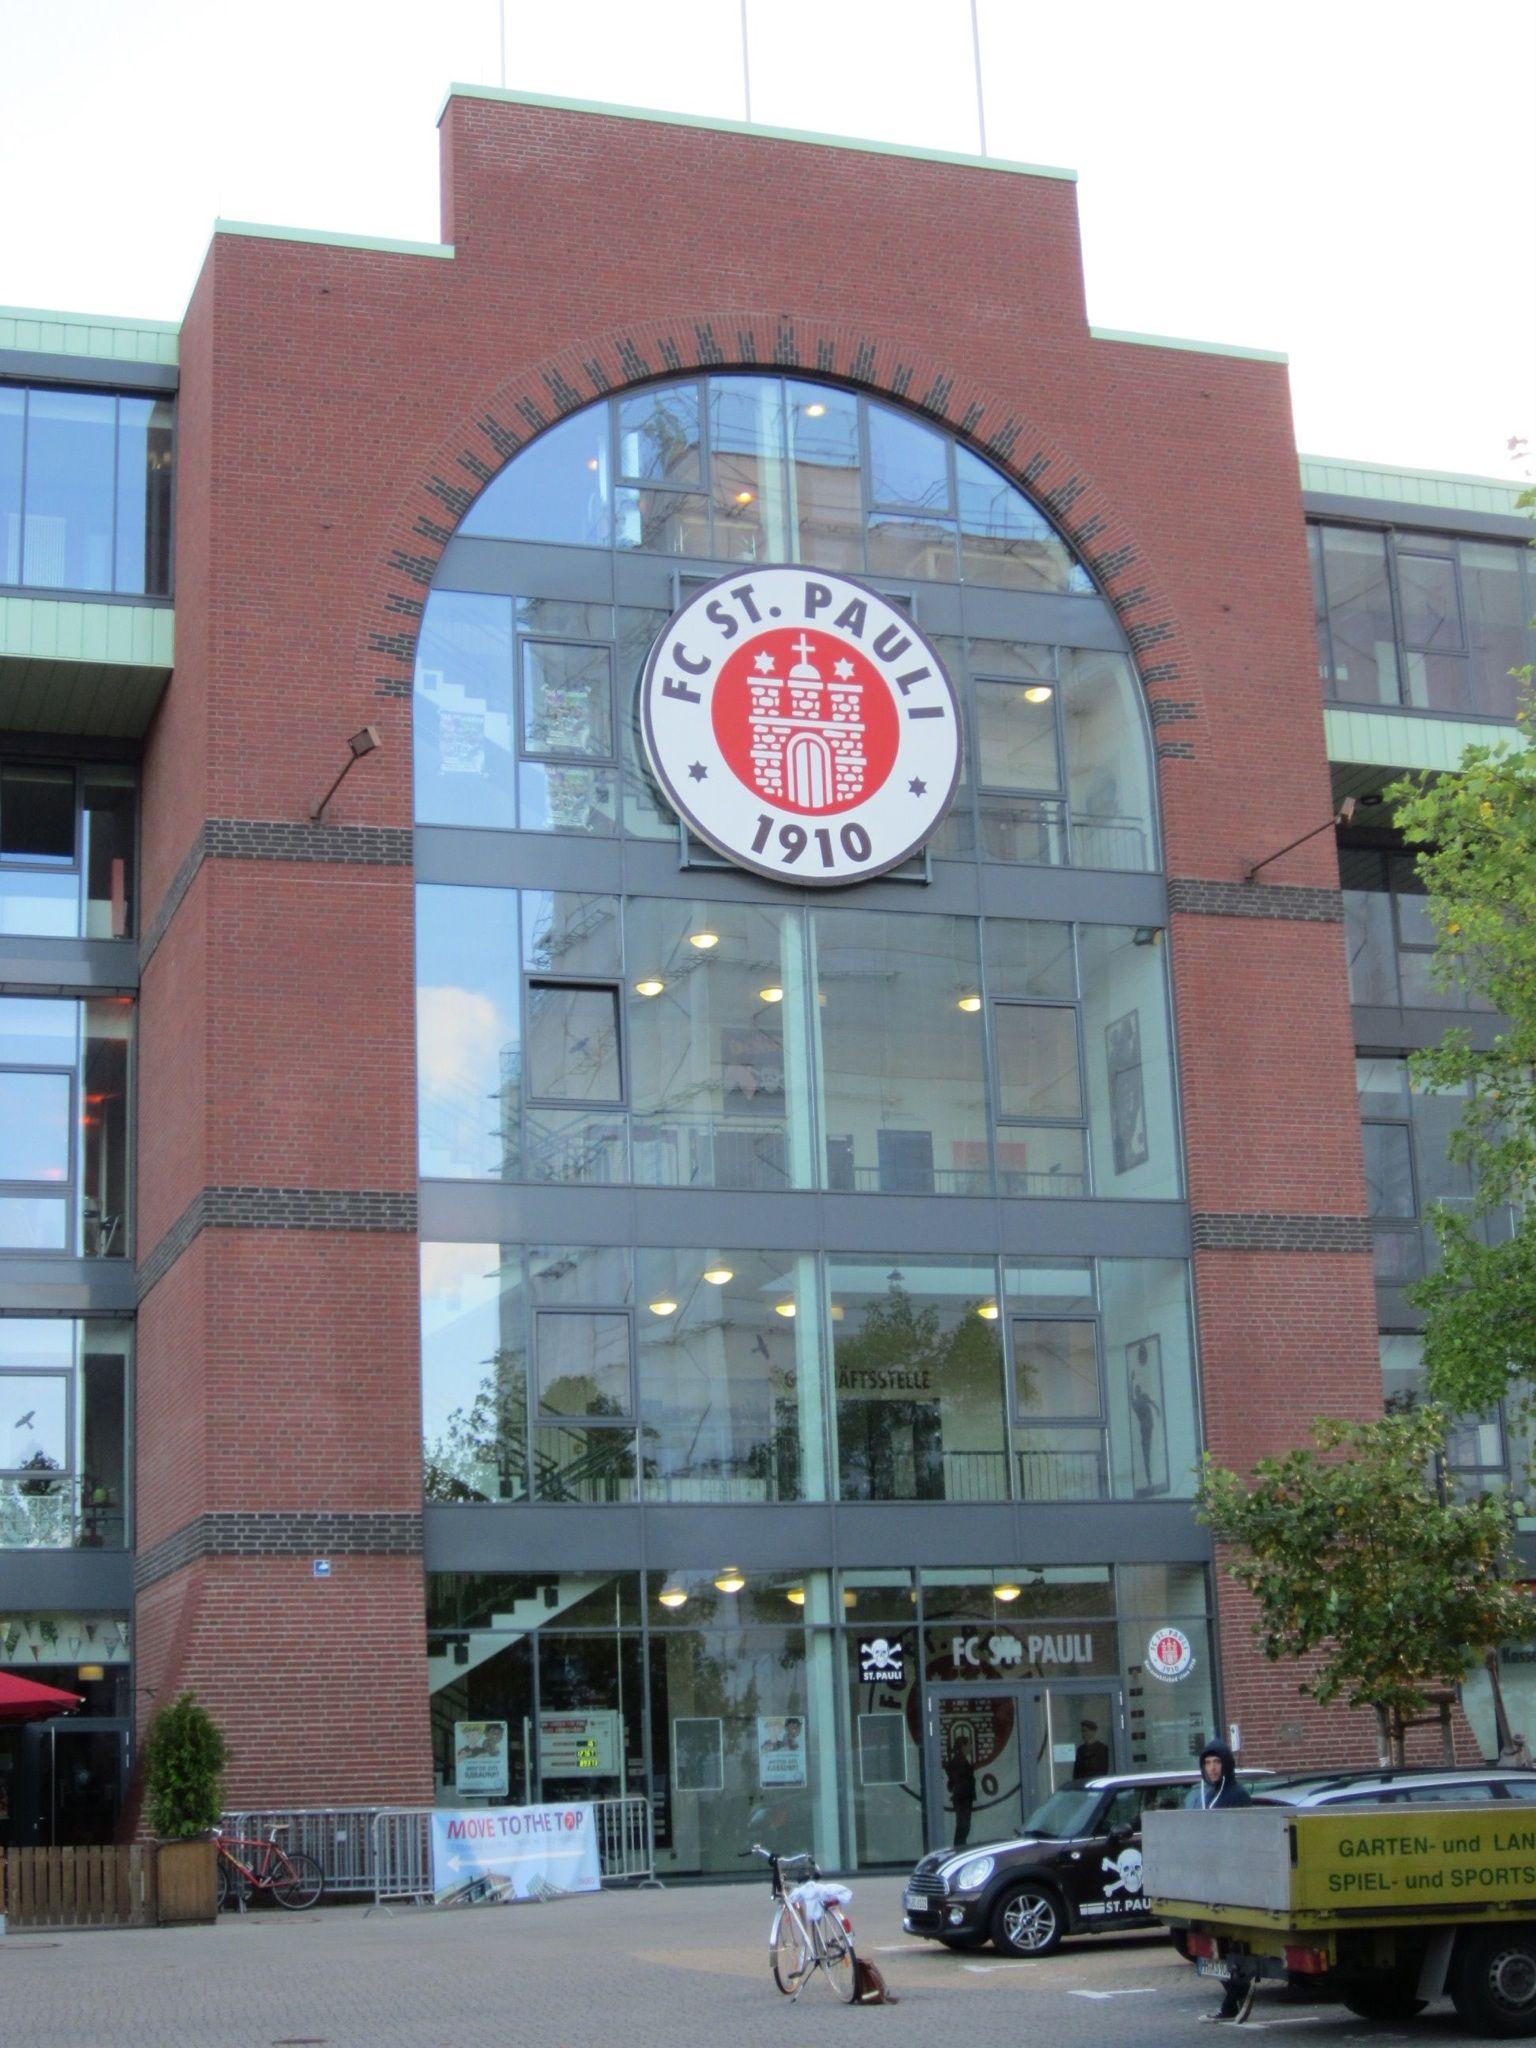 Millerntor Stadion Hamburg De Hamburg Hansestadt Hamburg